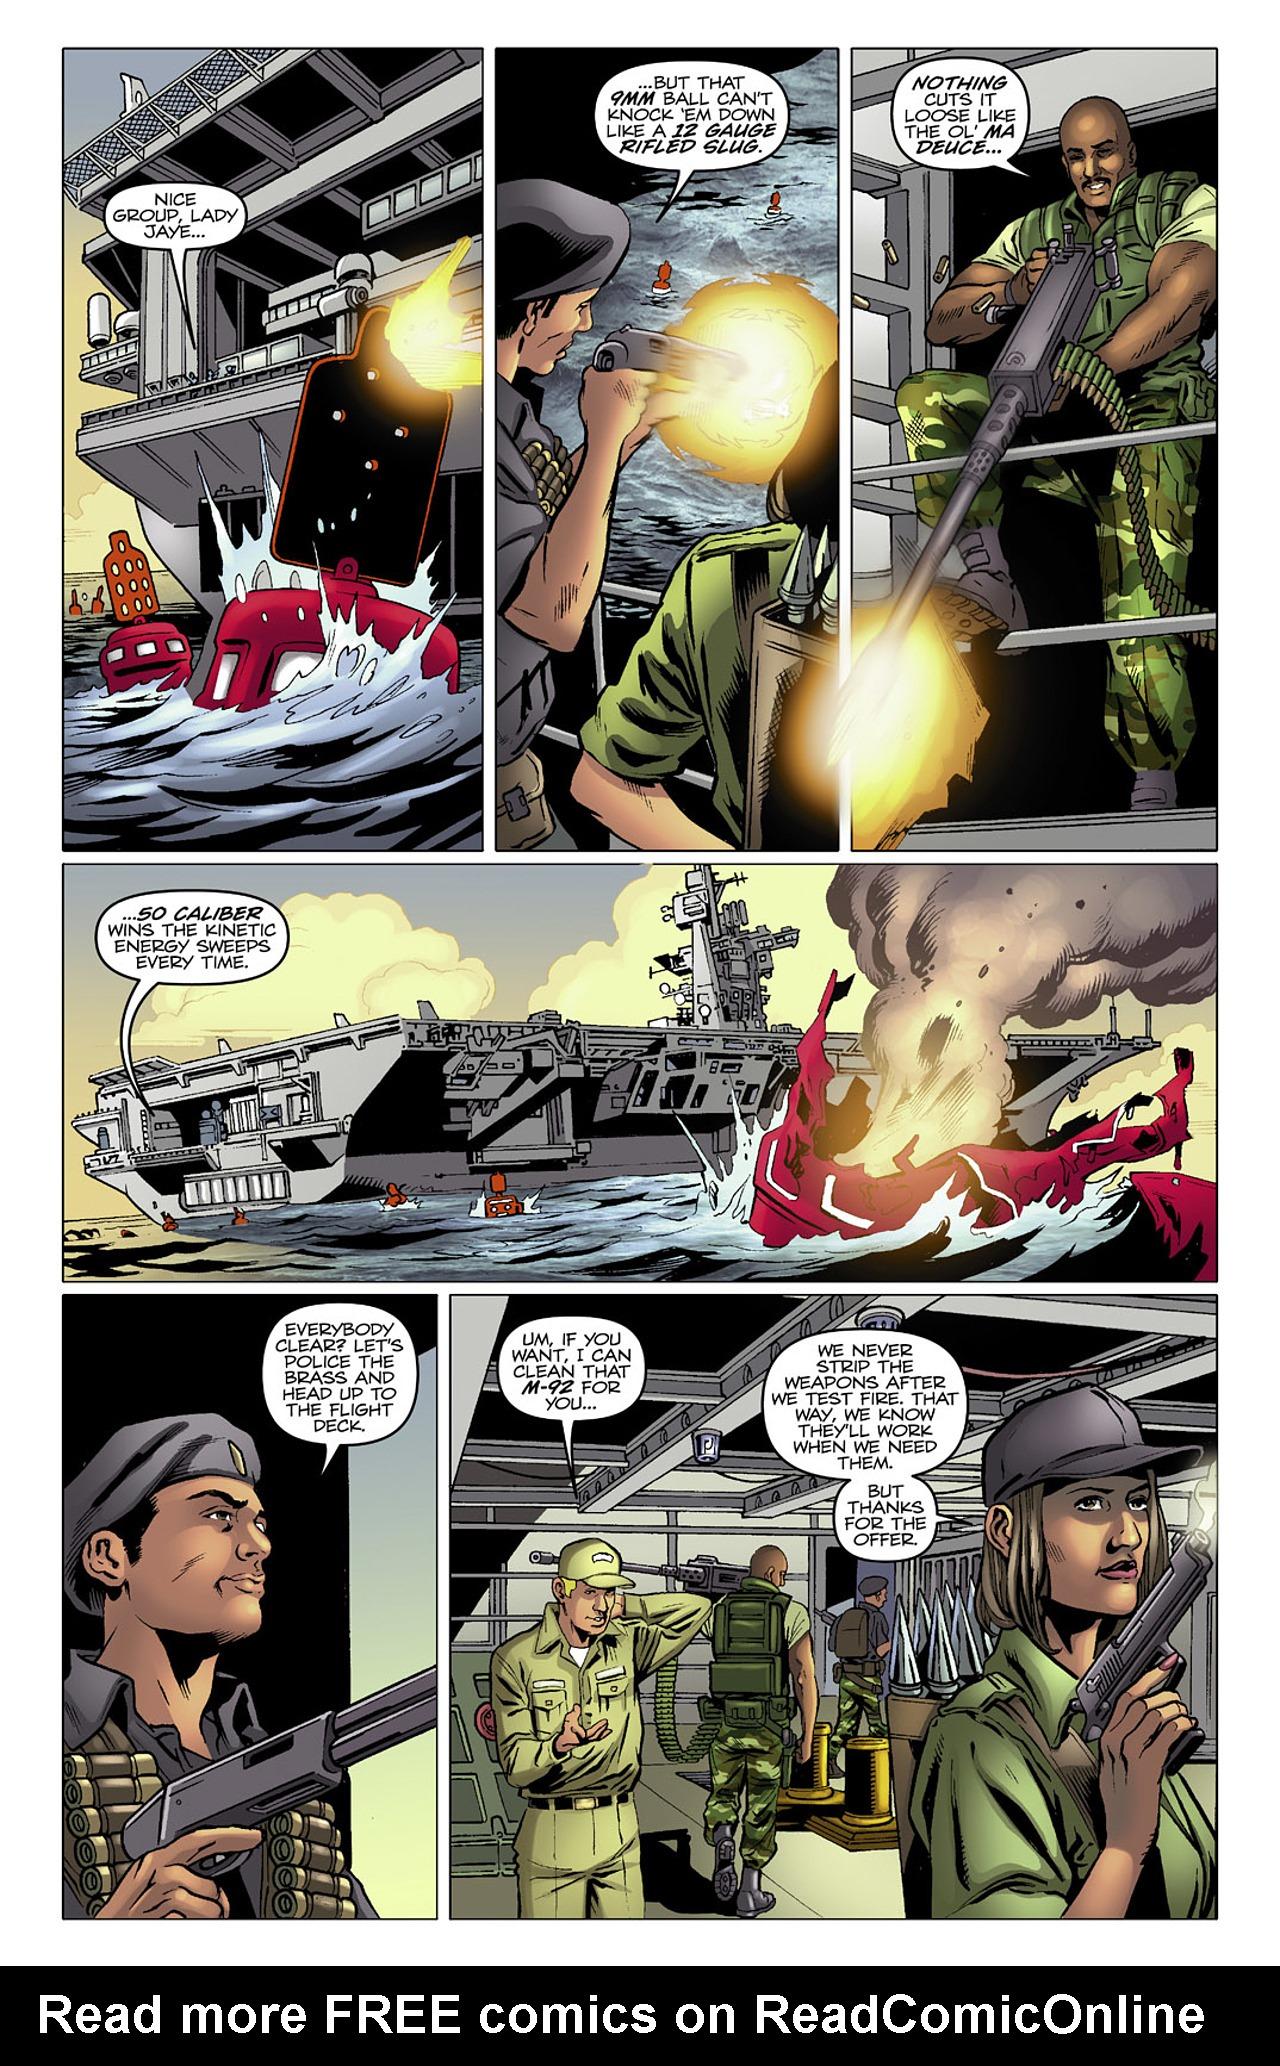 G.I. Joe: A Real American Hero 170 Page 6